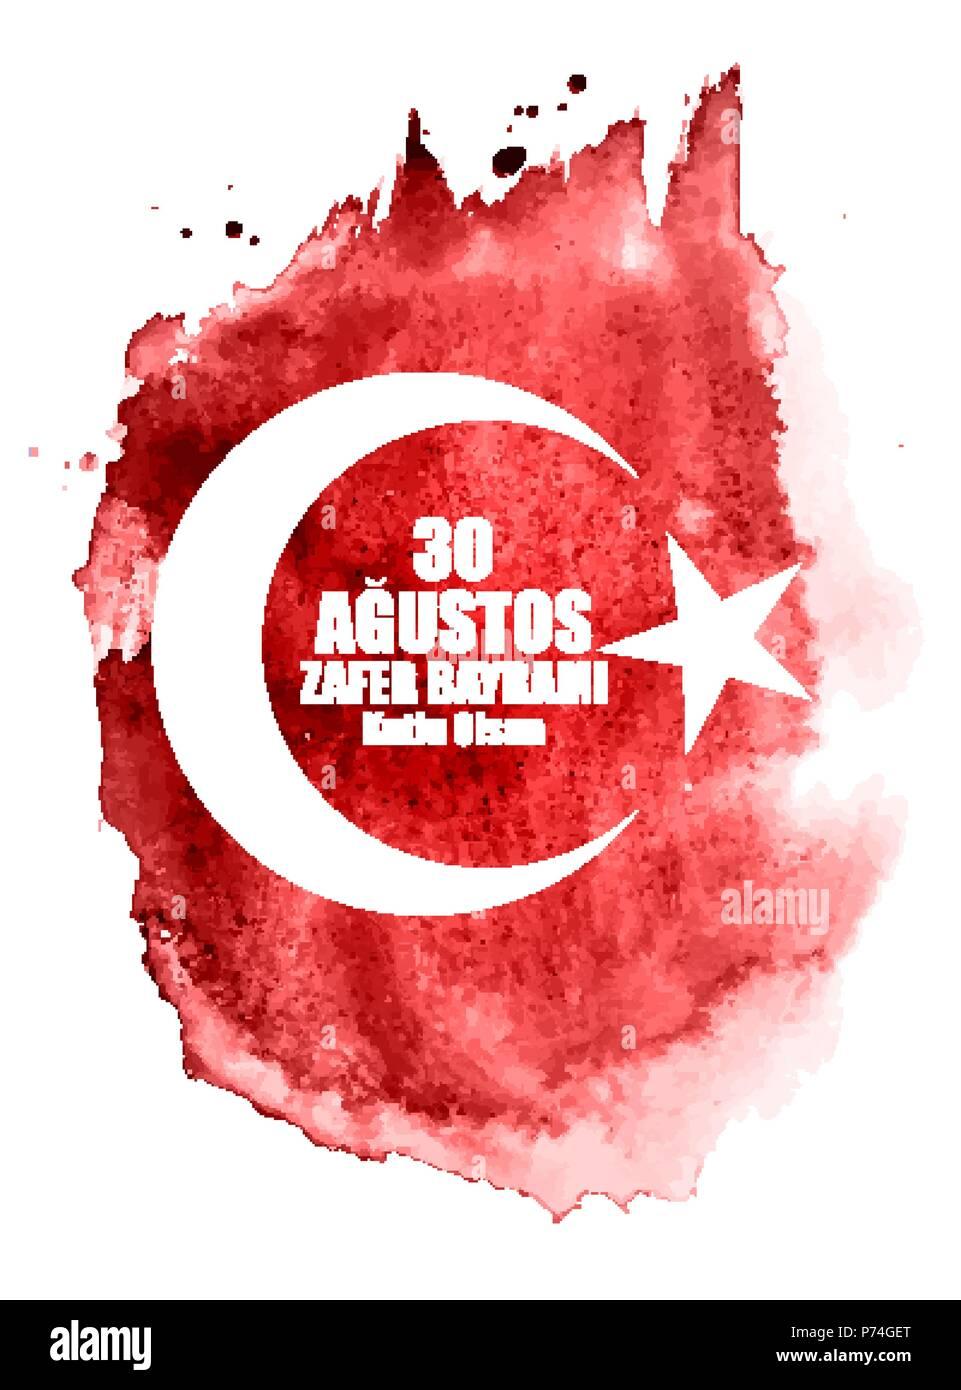 August 30, Victory Day (Turkish Speak: 0 Agustos, Zafer Bayrami Kutlu Olsun). Vector Illustration - Stock Image